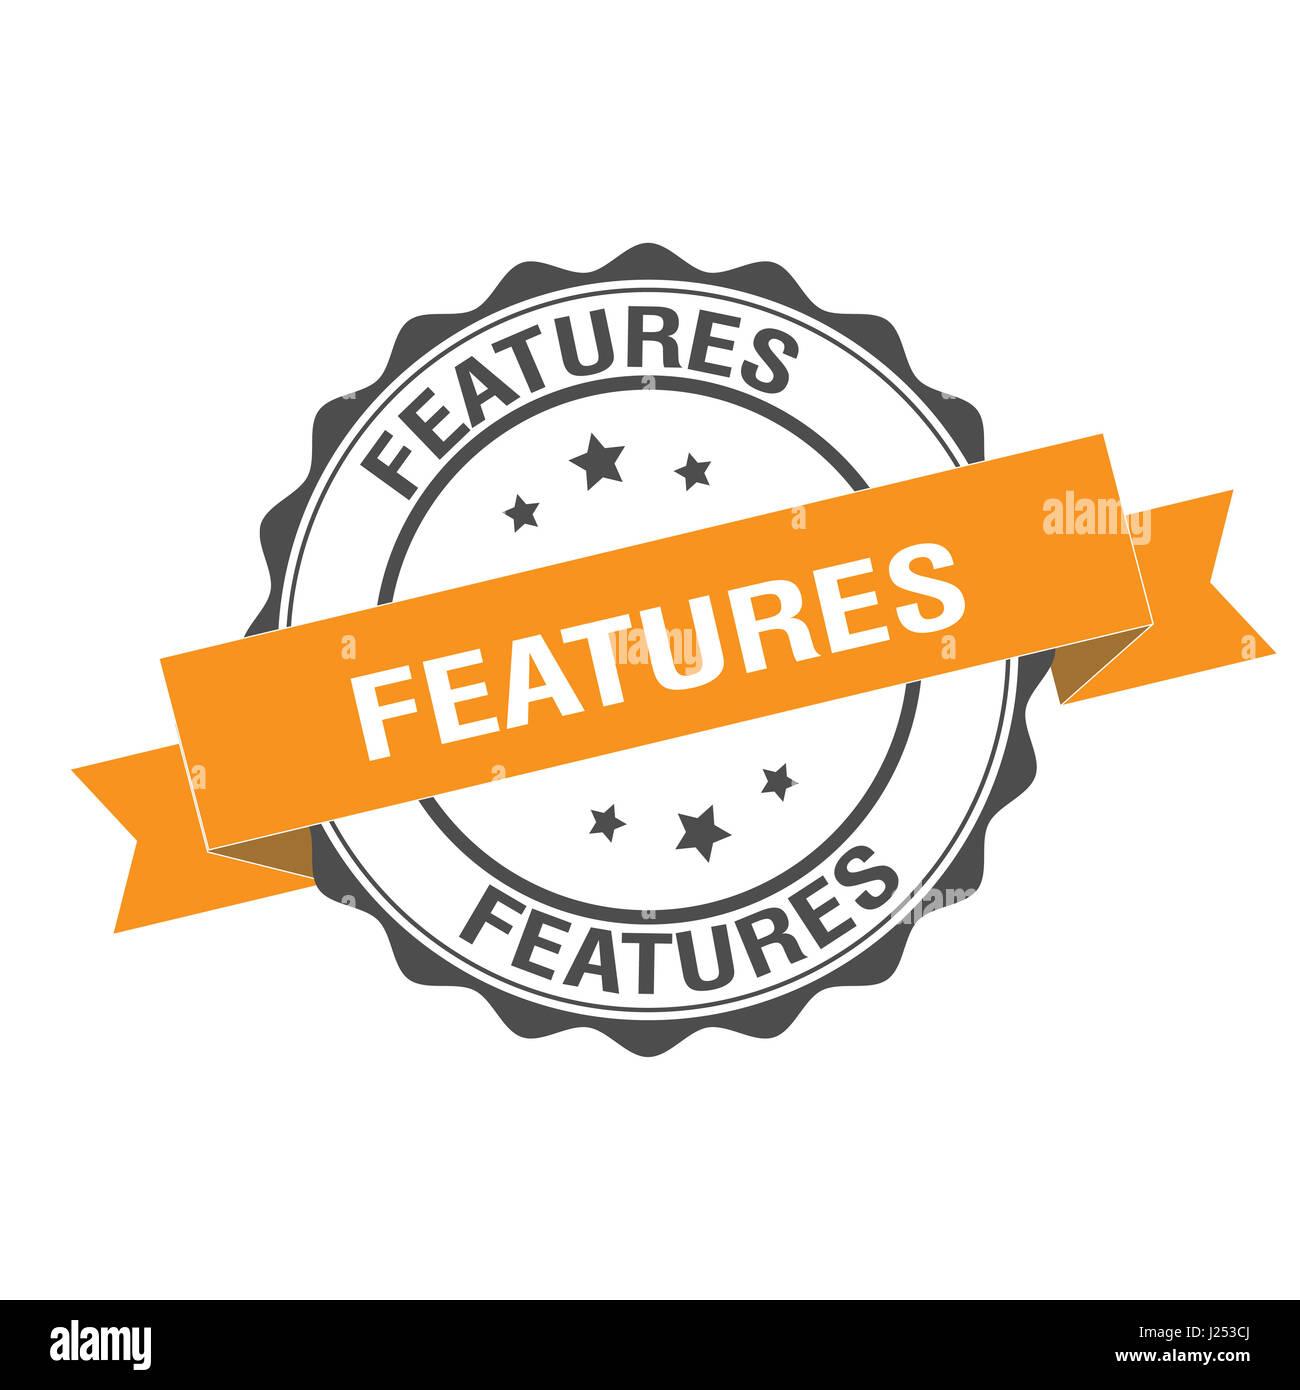 Illustration timbre Caractéristiques Photo Stock